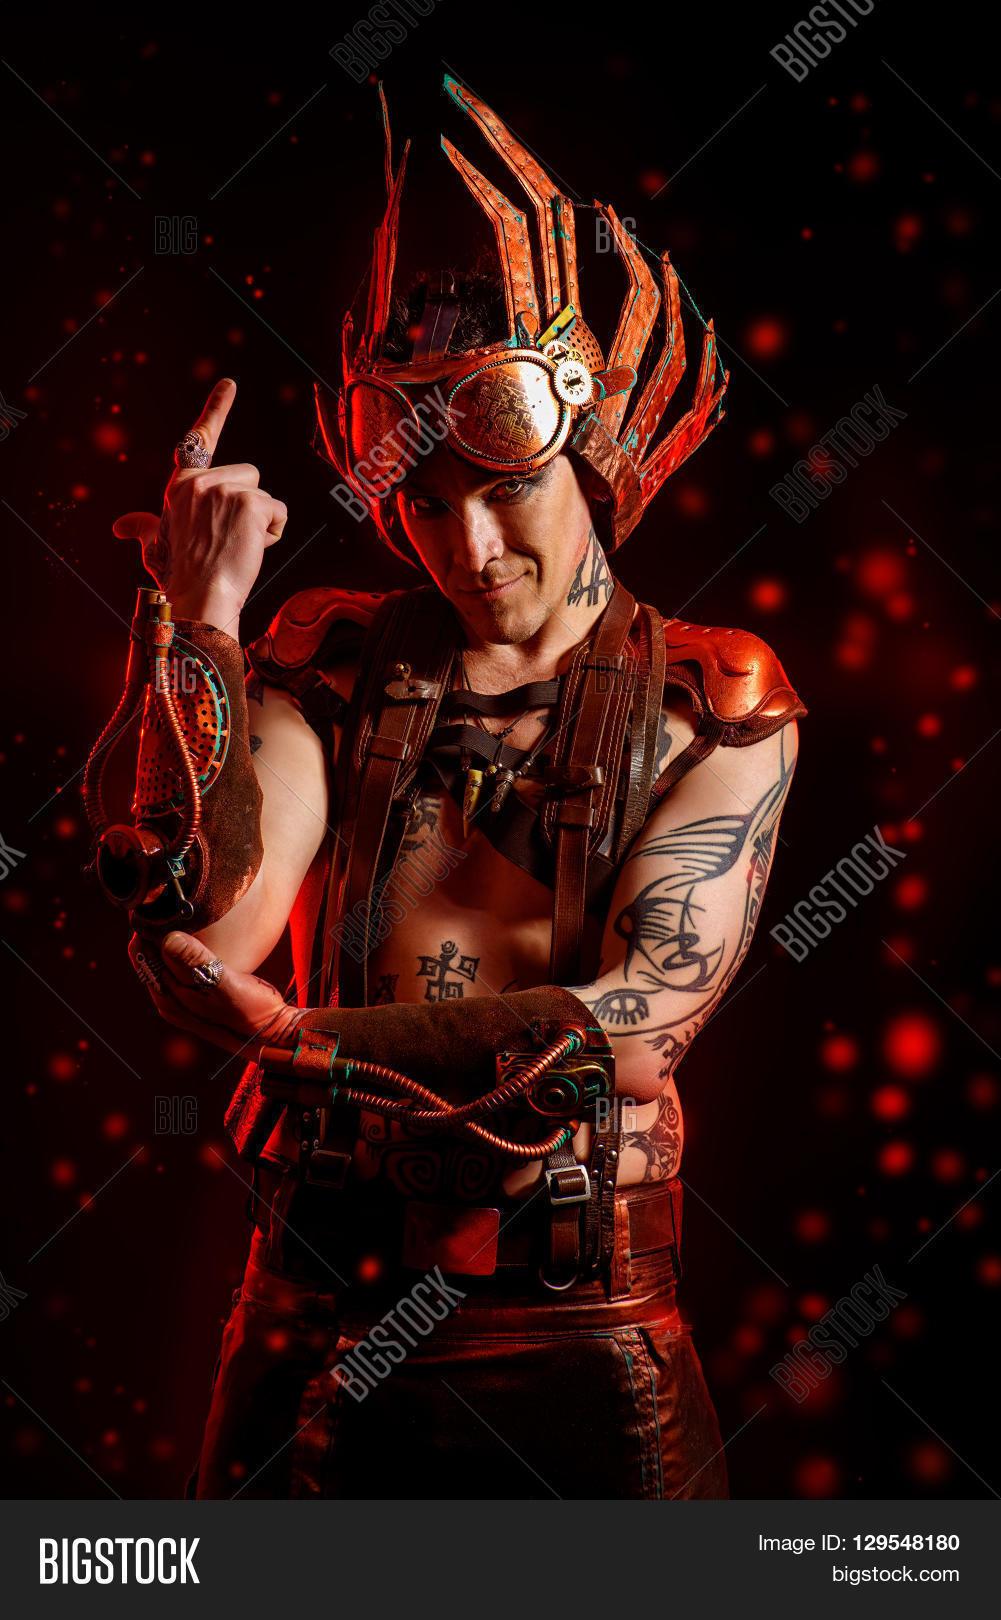 Fire Steampunk Man Image Photo Free Trial Bigstock